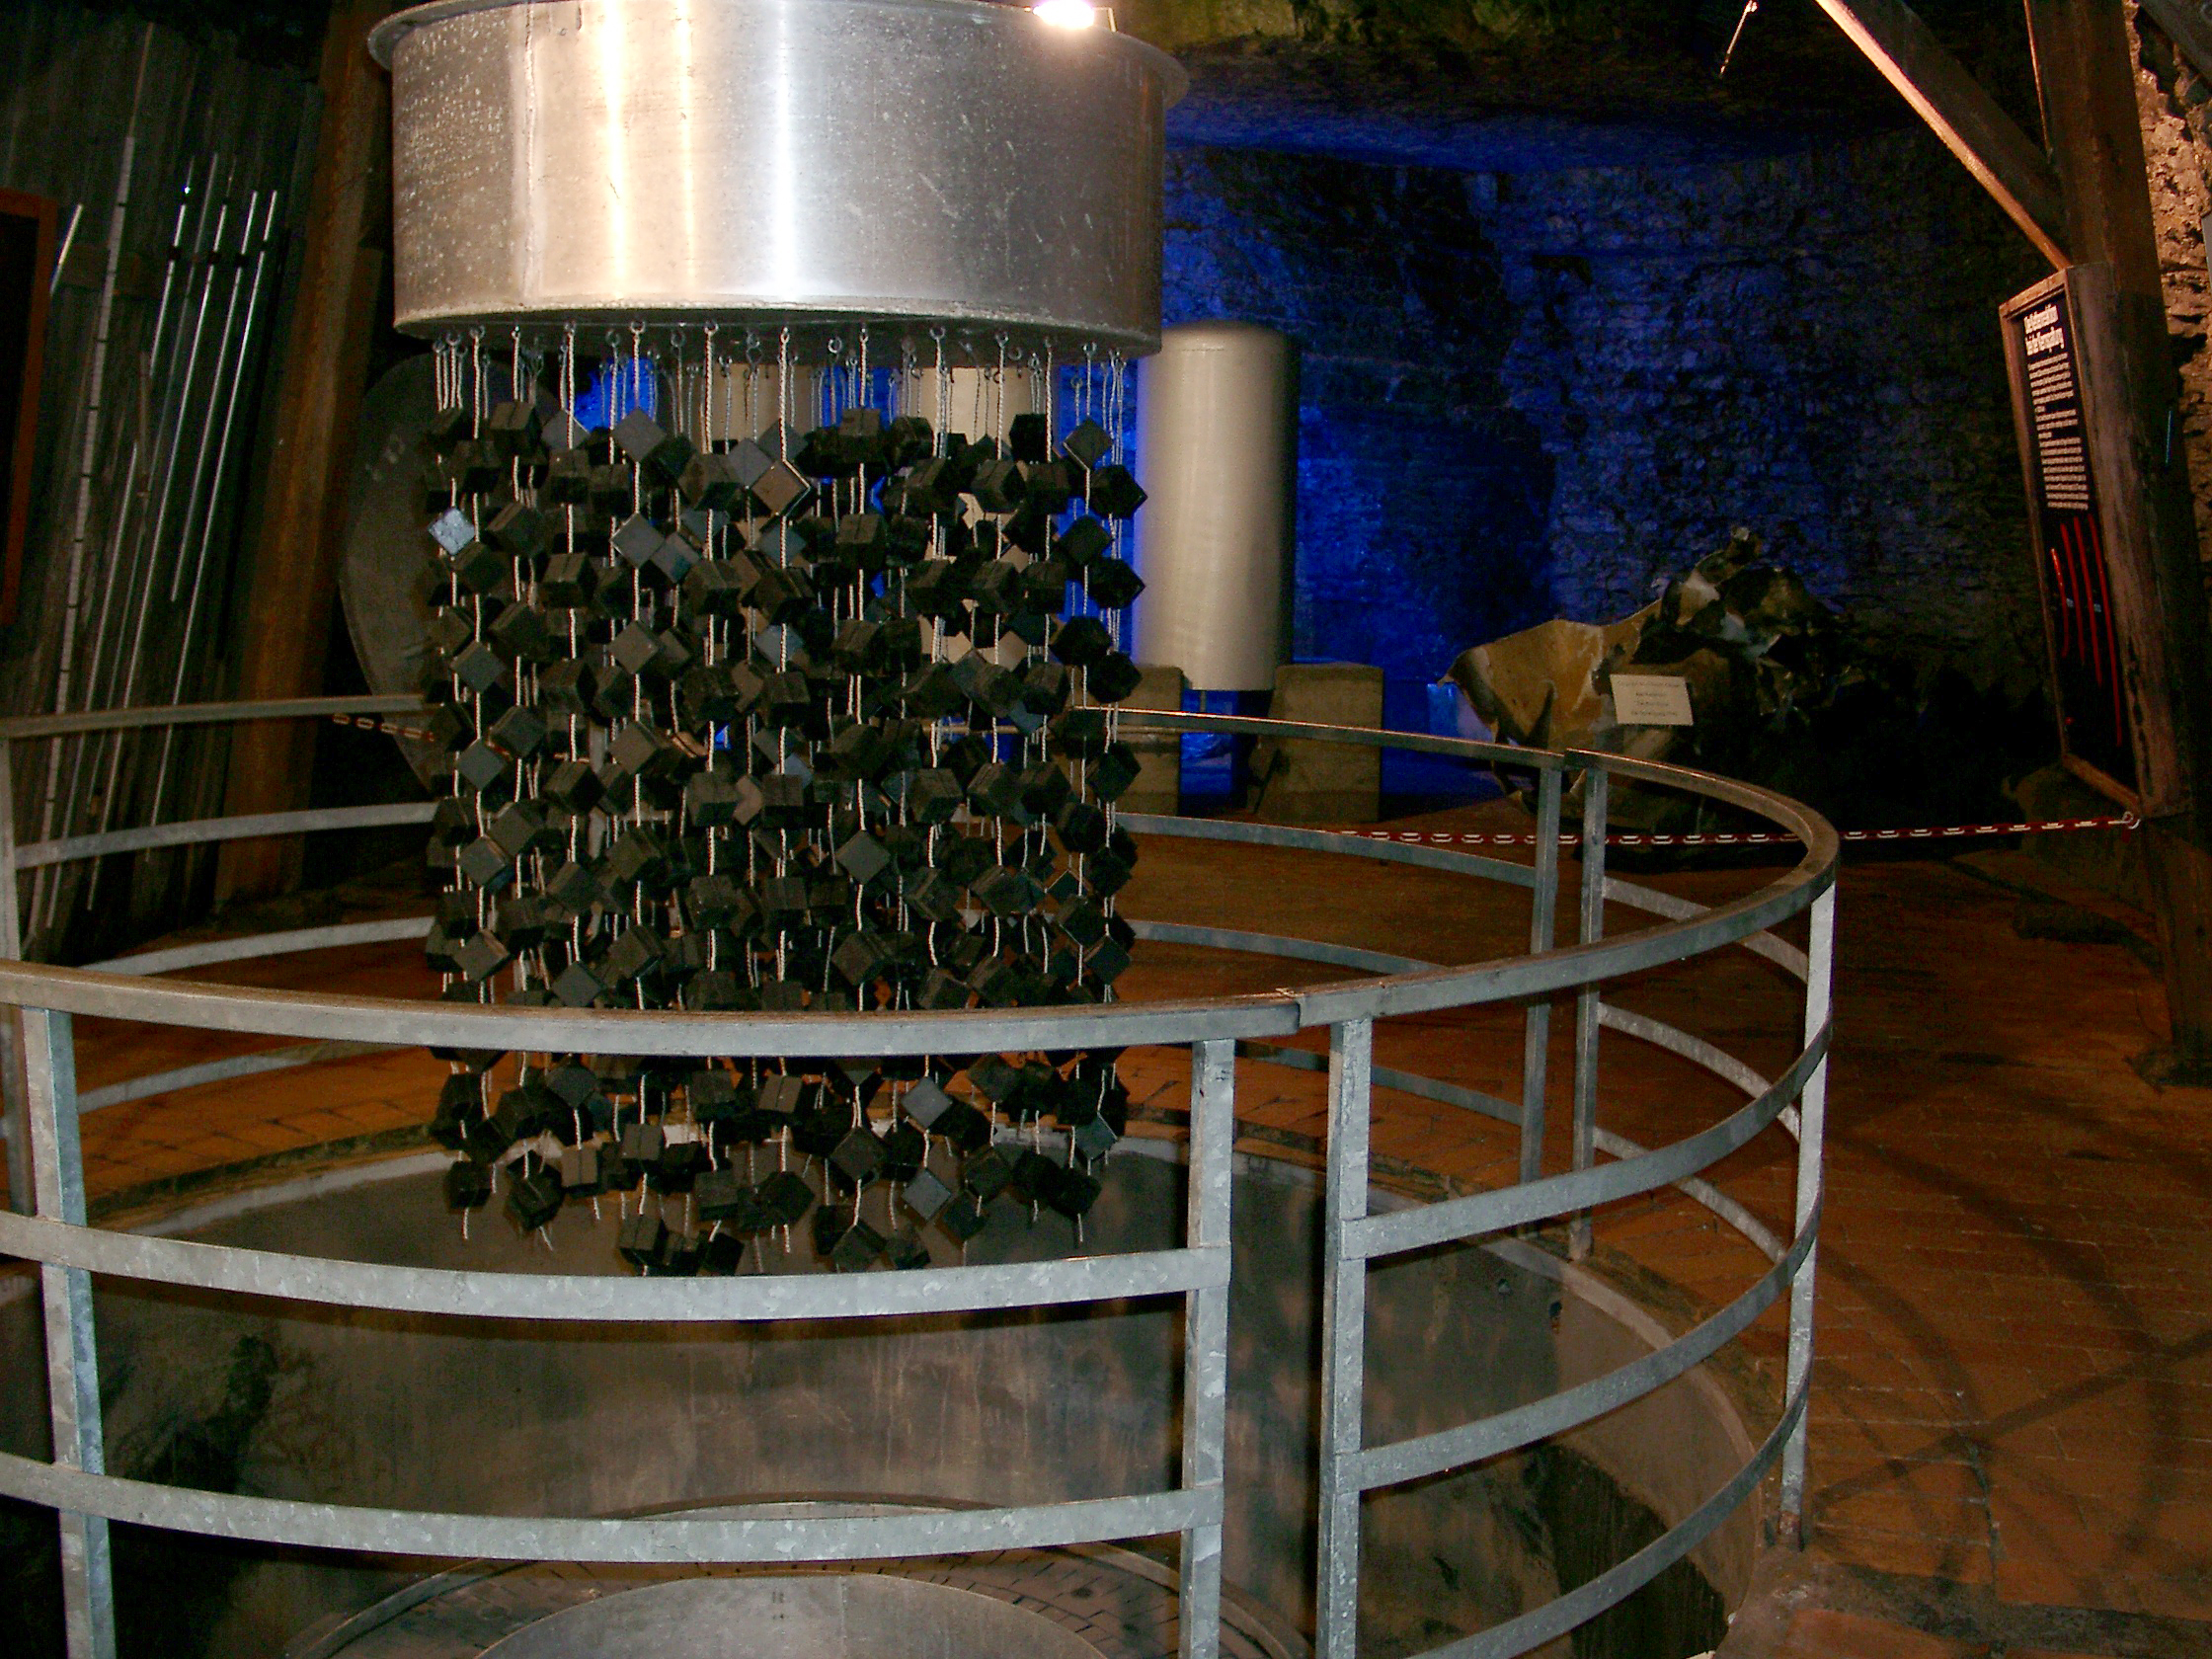 external image Haigerloch-nuclear-reactor.JPG